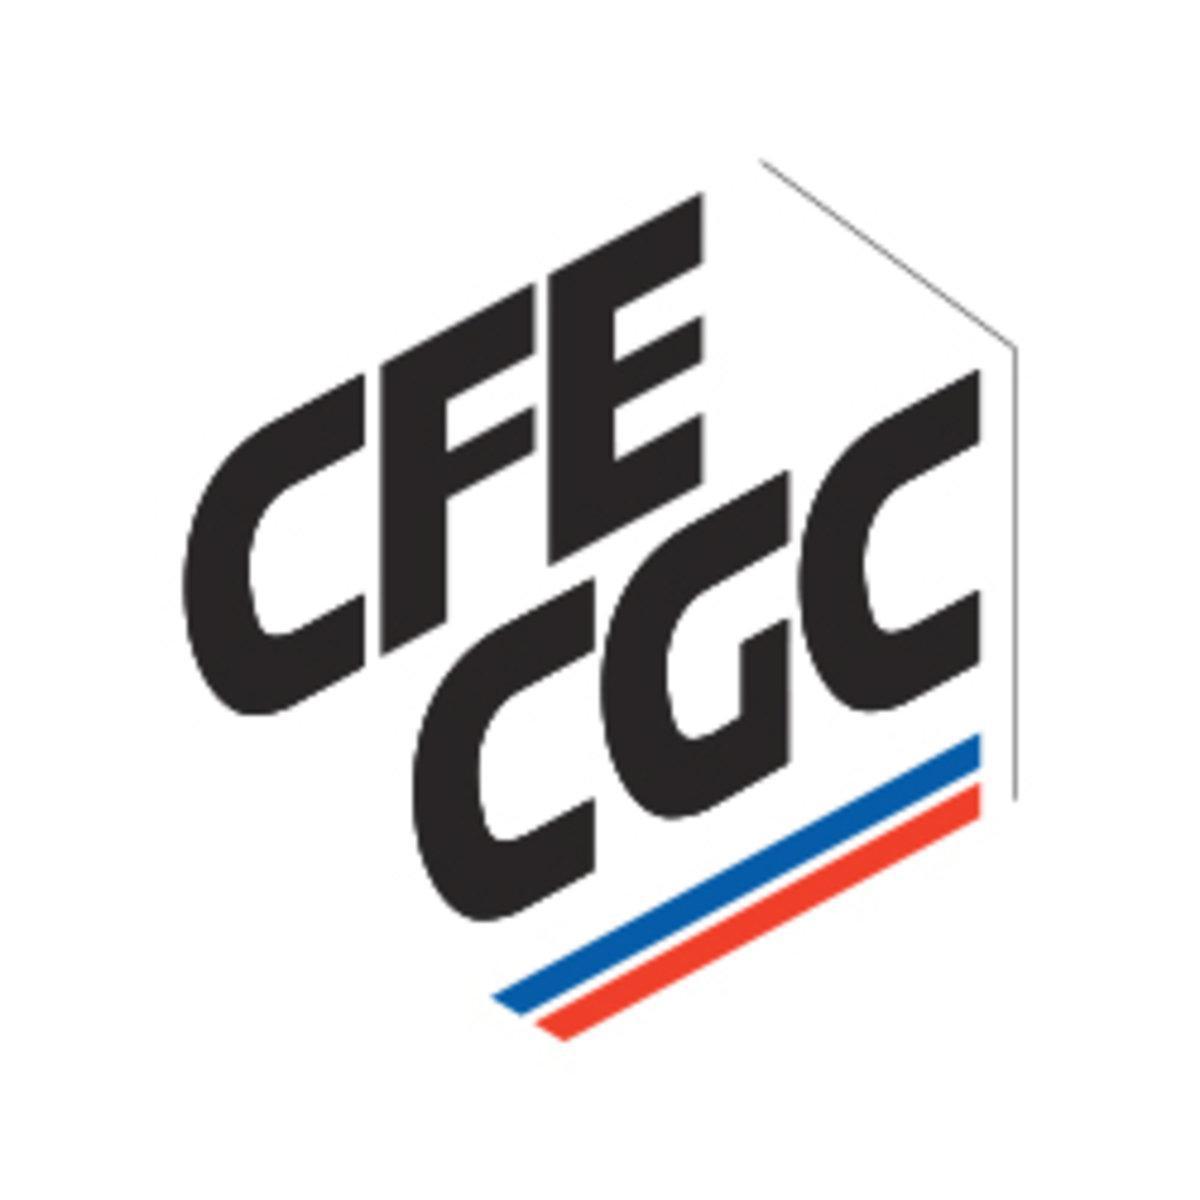 Thèmes d'action de la CFE-CGC